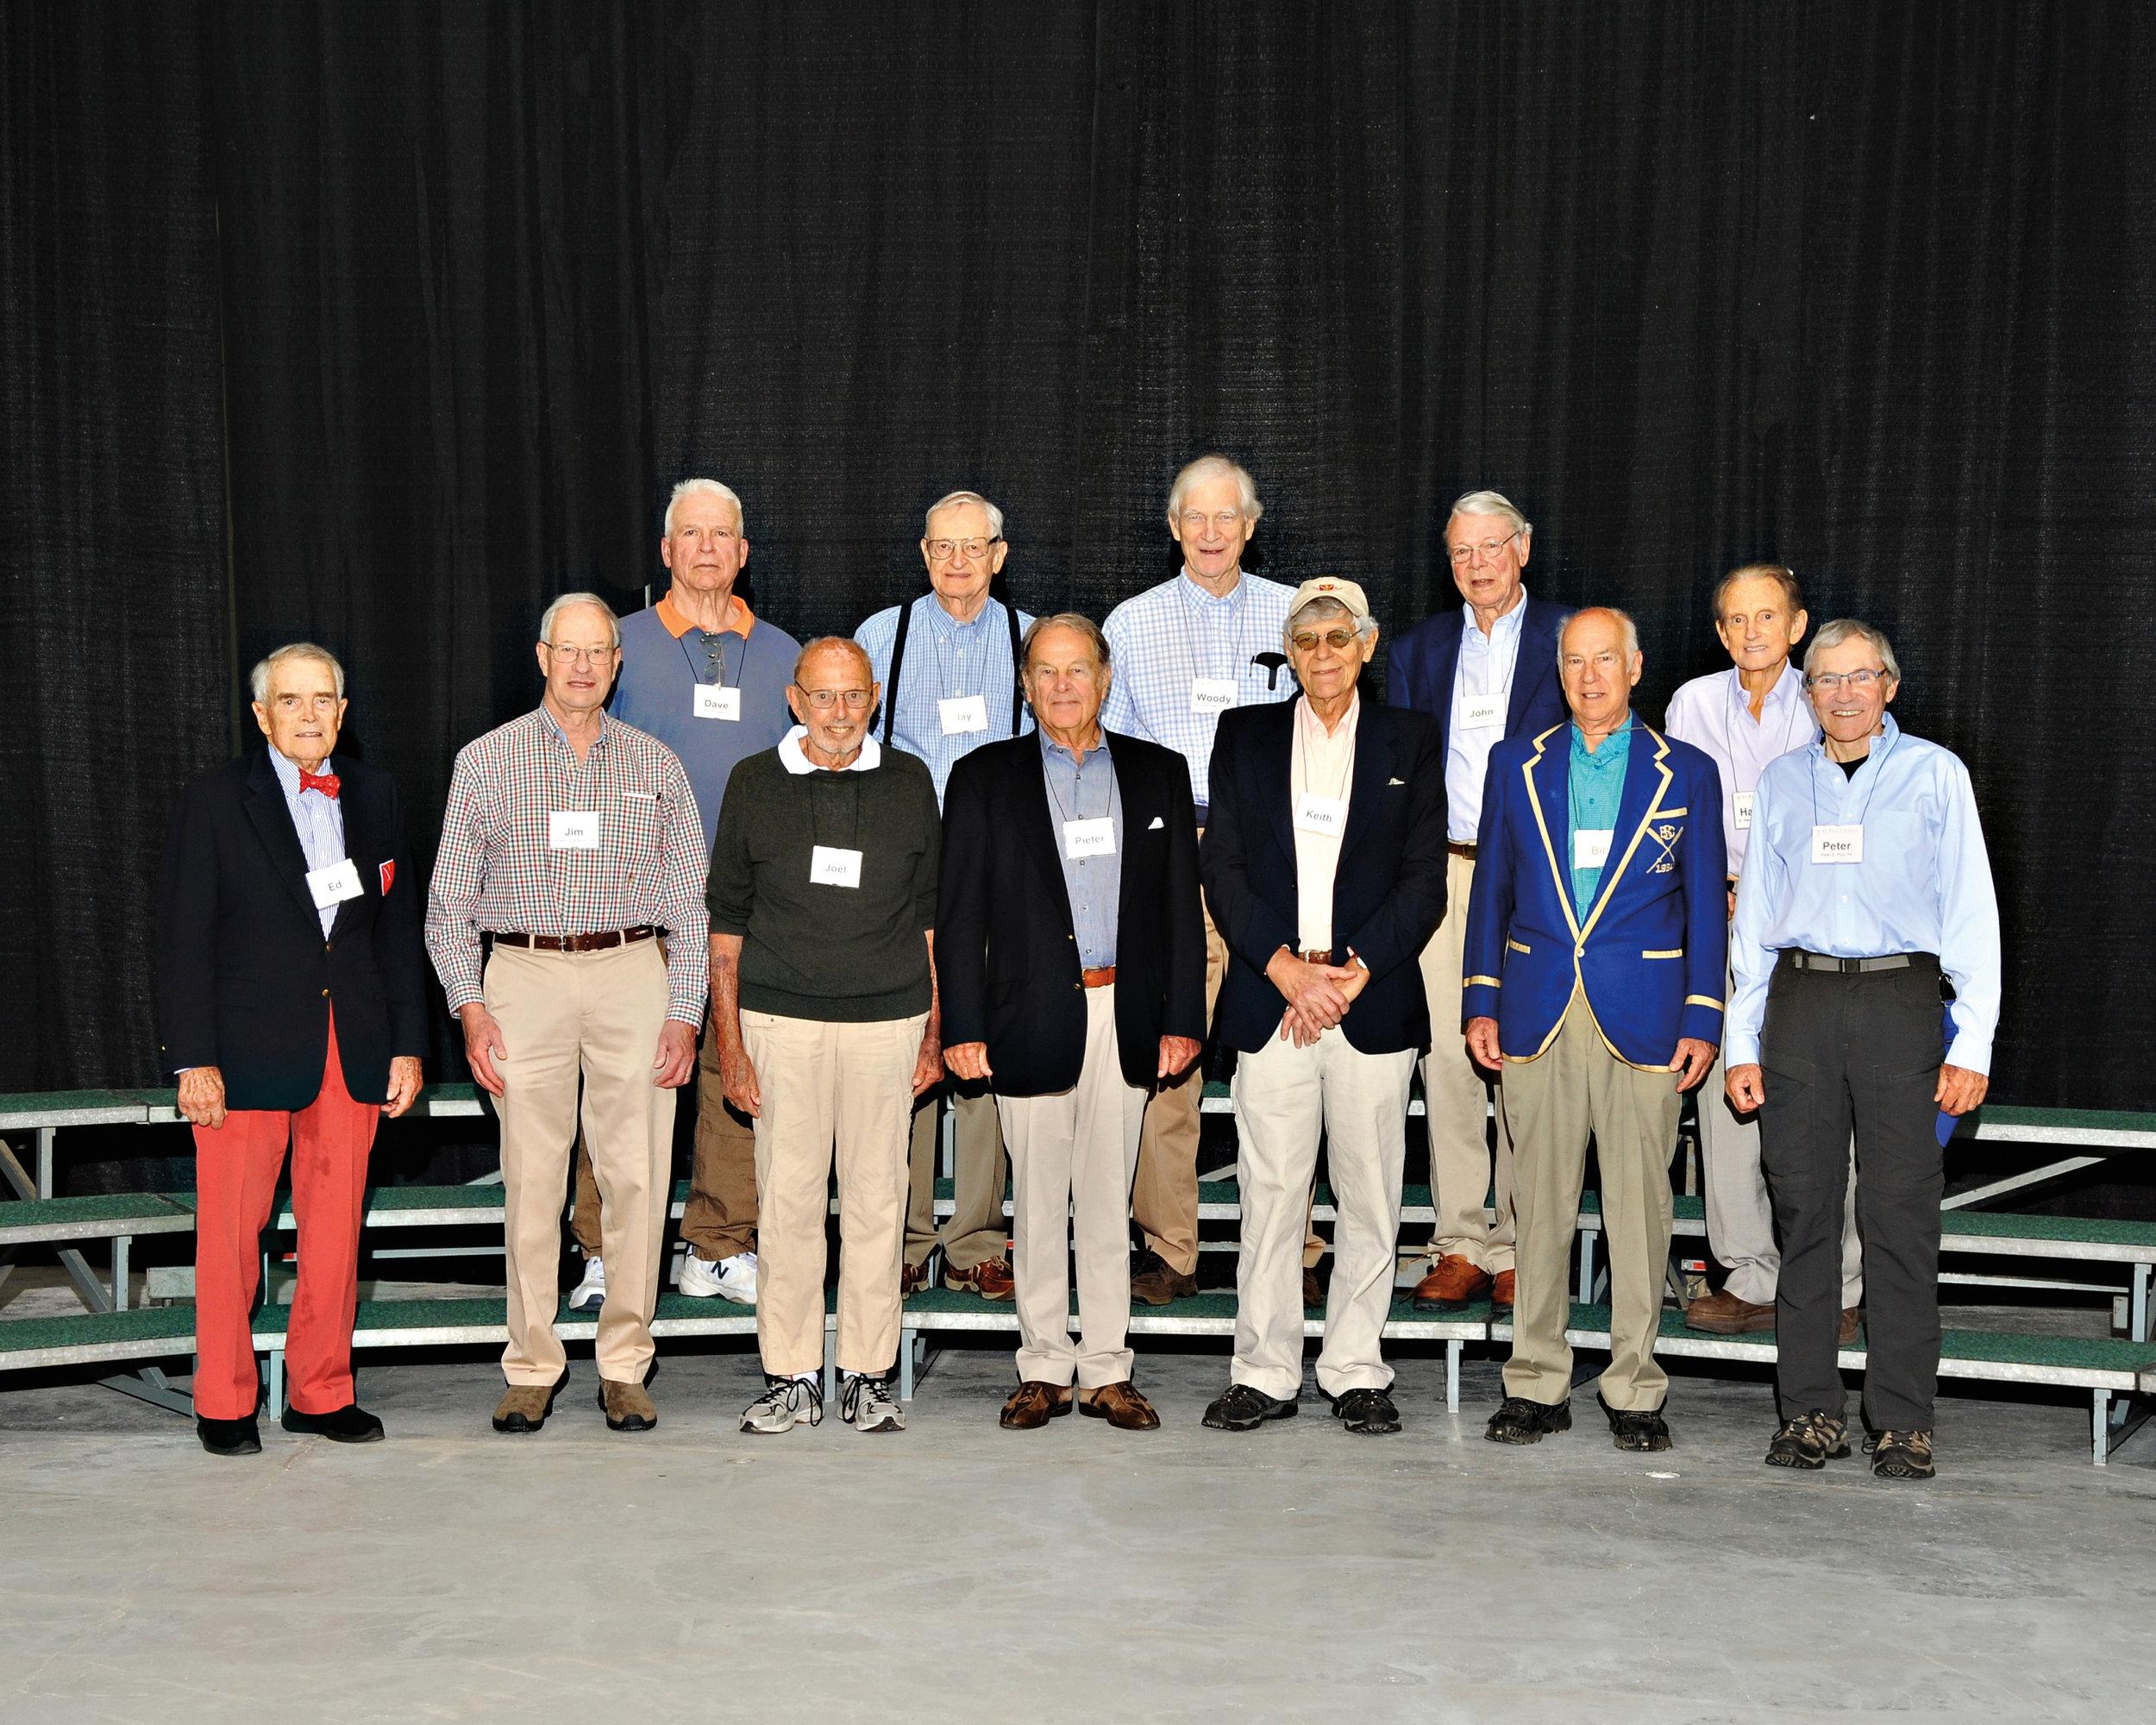 (L. to r.) row 1: Ed Harding, Jim Darby, Joel Reynolds, Pieter Greeff, Keith Lorenz, Bill McKim, Peter Pool; row 2: Dave Watts, Jay Cushman, Woody Waldron, John McGinley, and Harvey Sloane.